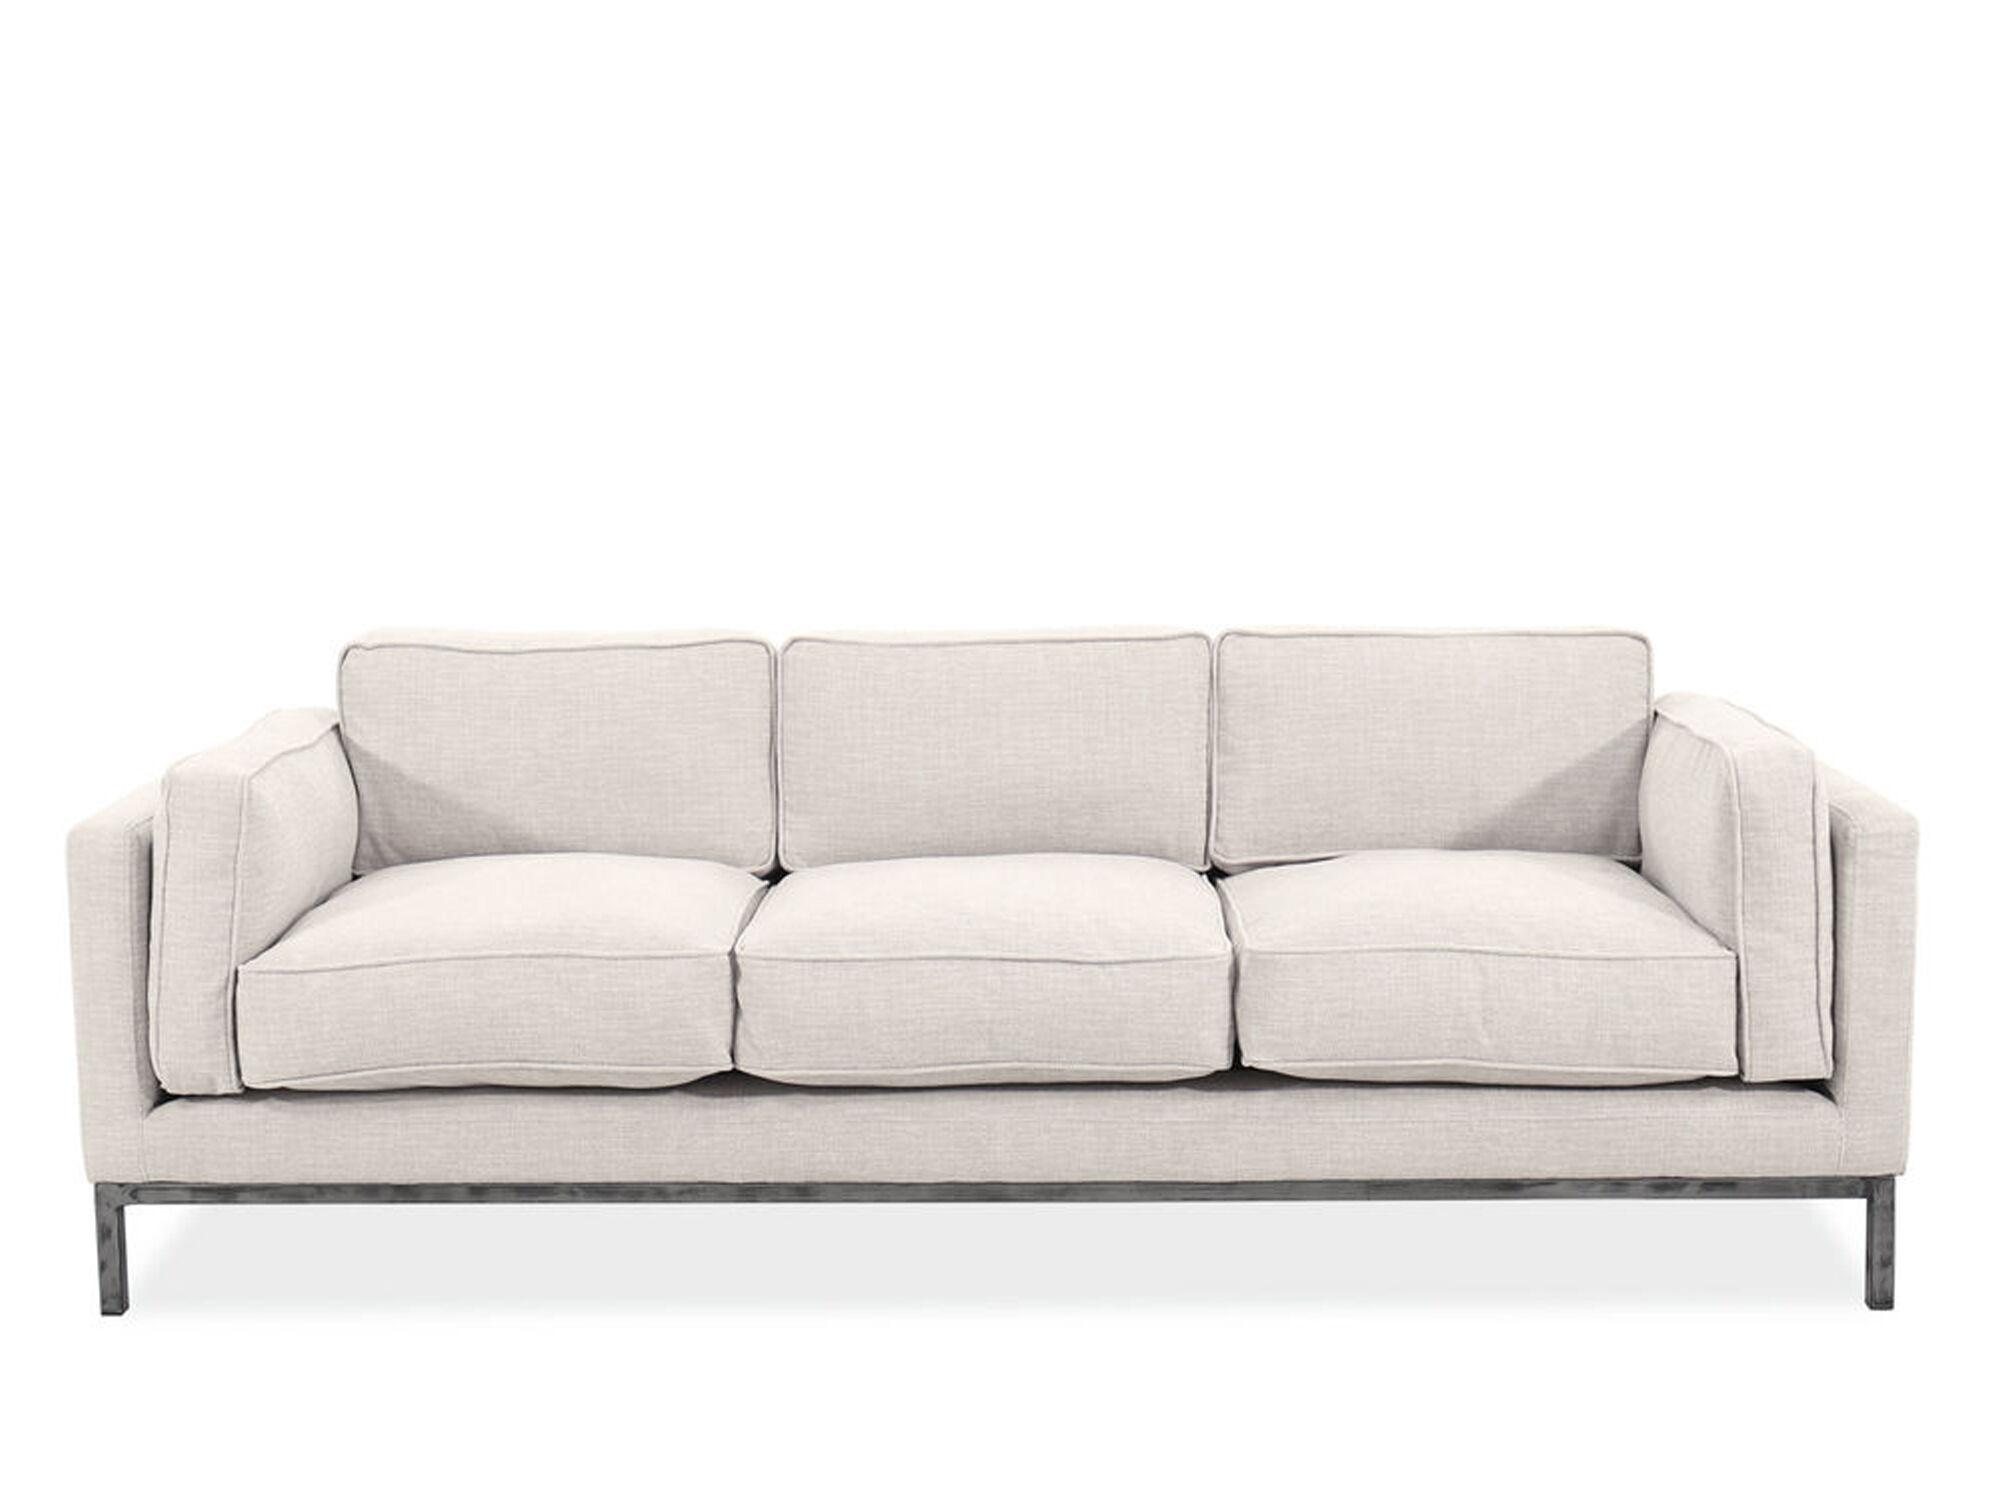 89 Quot Contemporary Low Profile Sofa In Beige Mathis